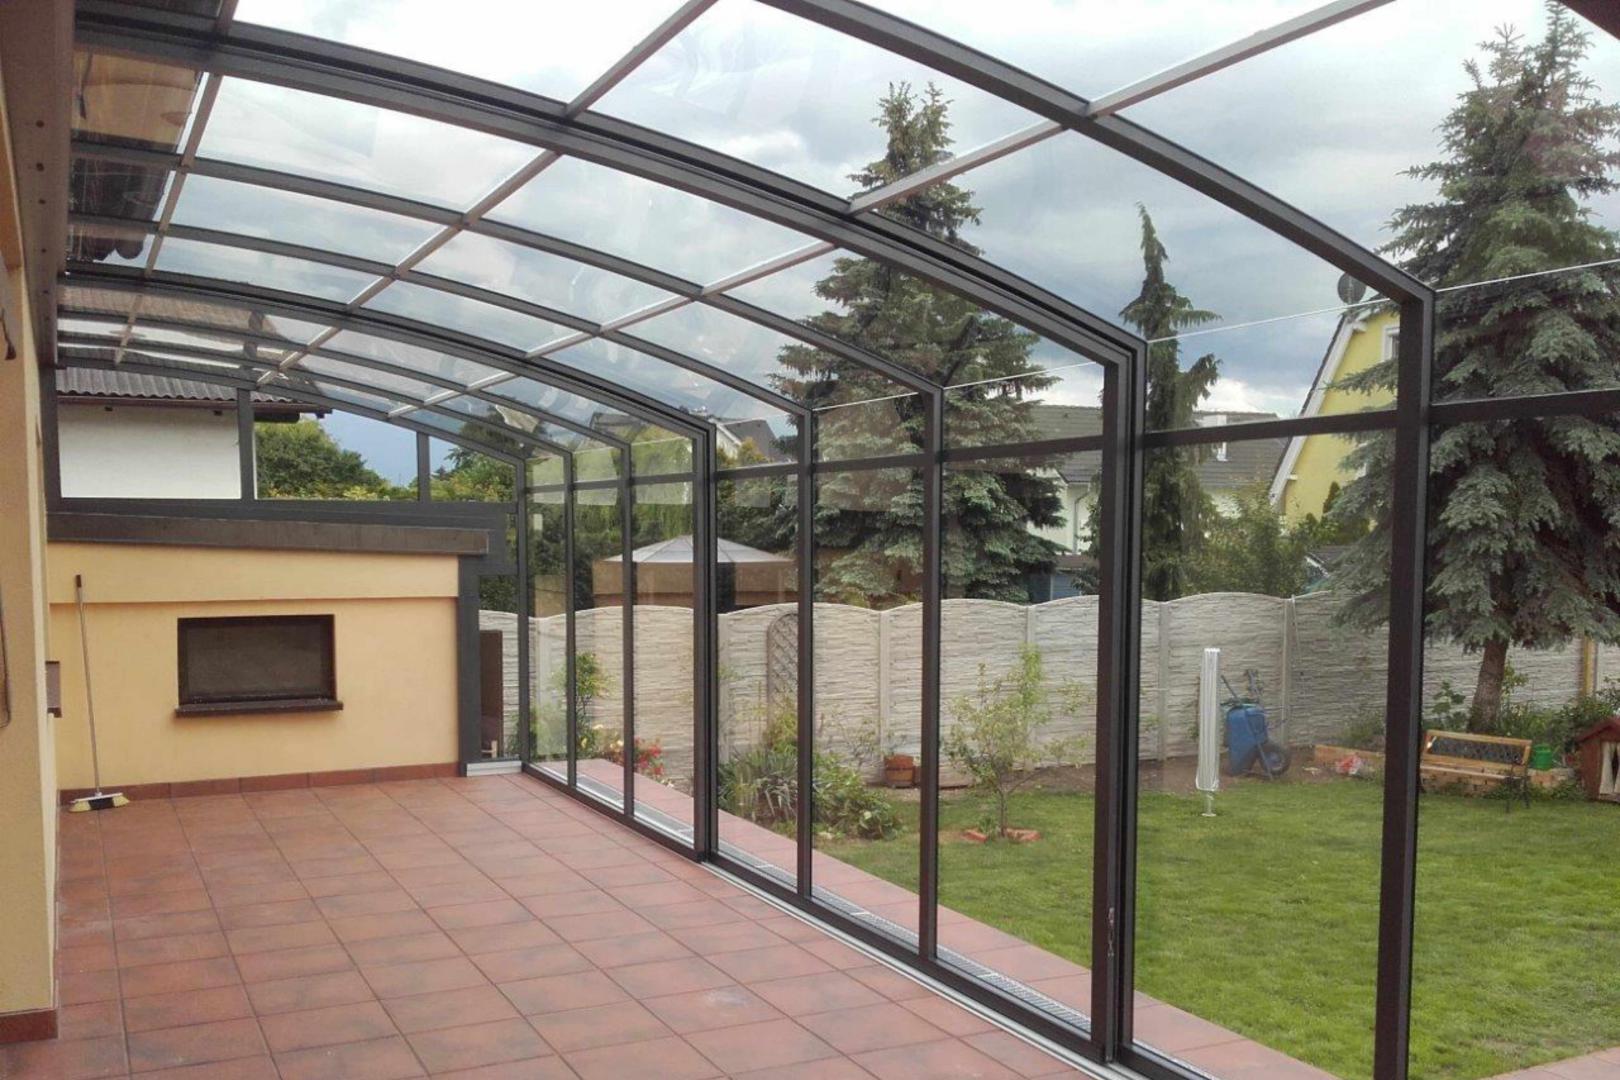 Abri De Terrasse Topaz A Pans Droits La Solar Veranda Topas